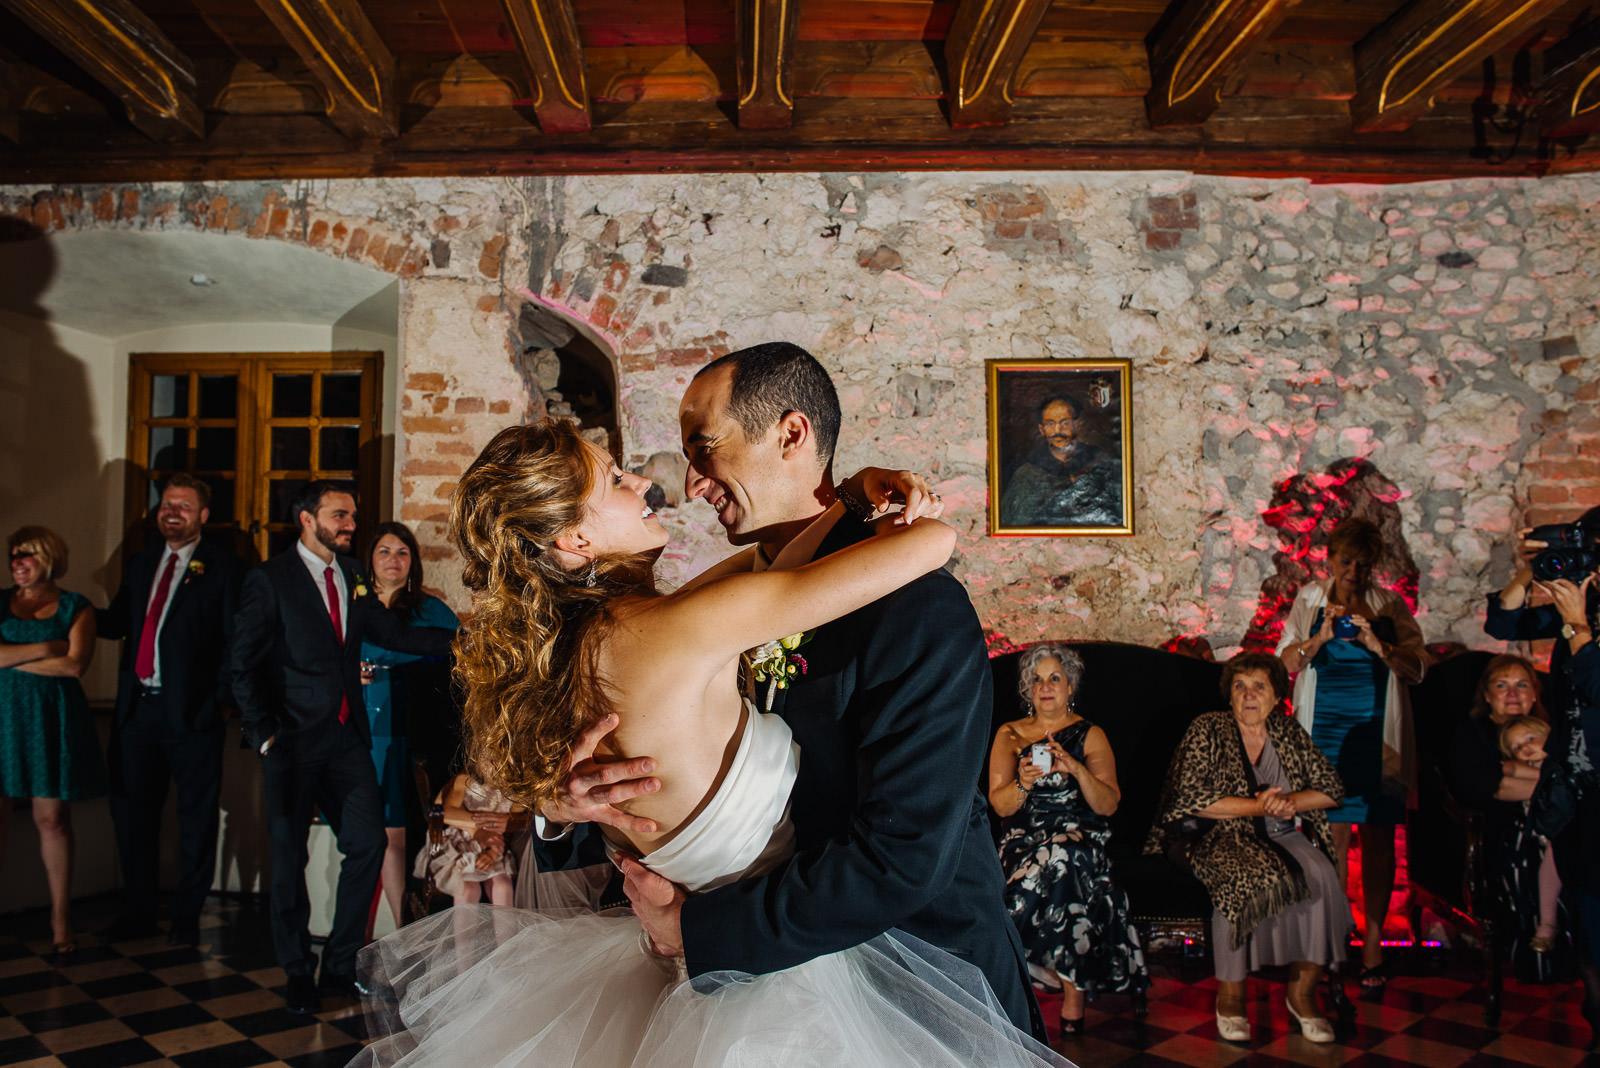 Castle Wedding Photography Korzkiew Poland 105